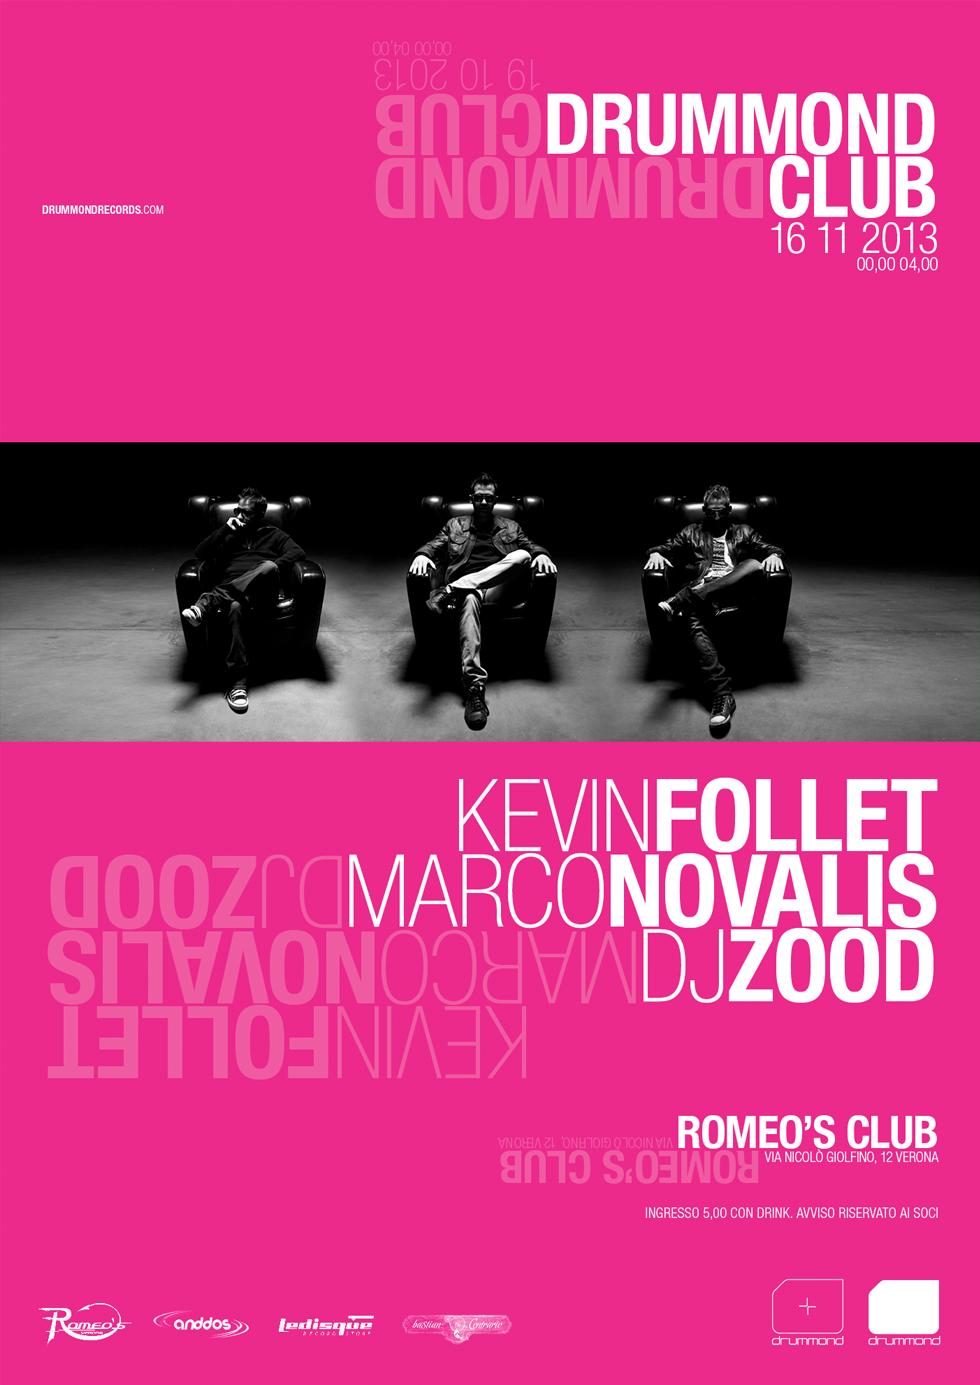 Drummond Club 2, Poster. Designer Cristiano Garonzi